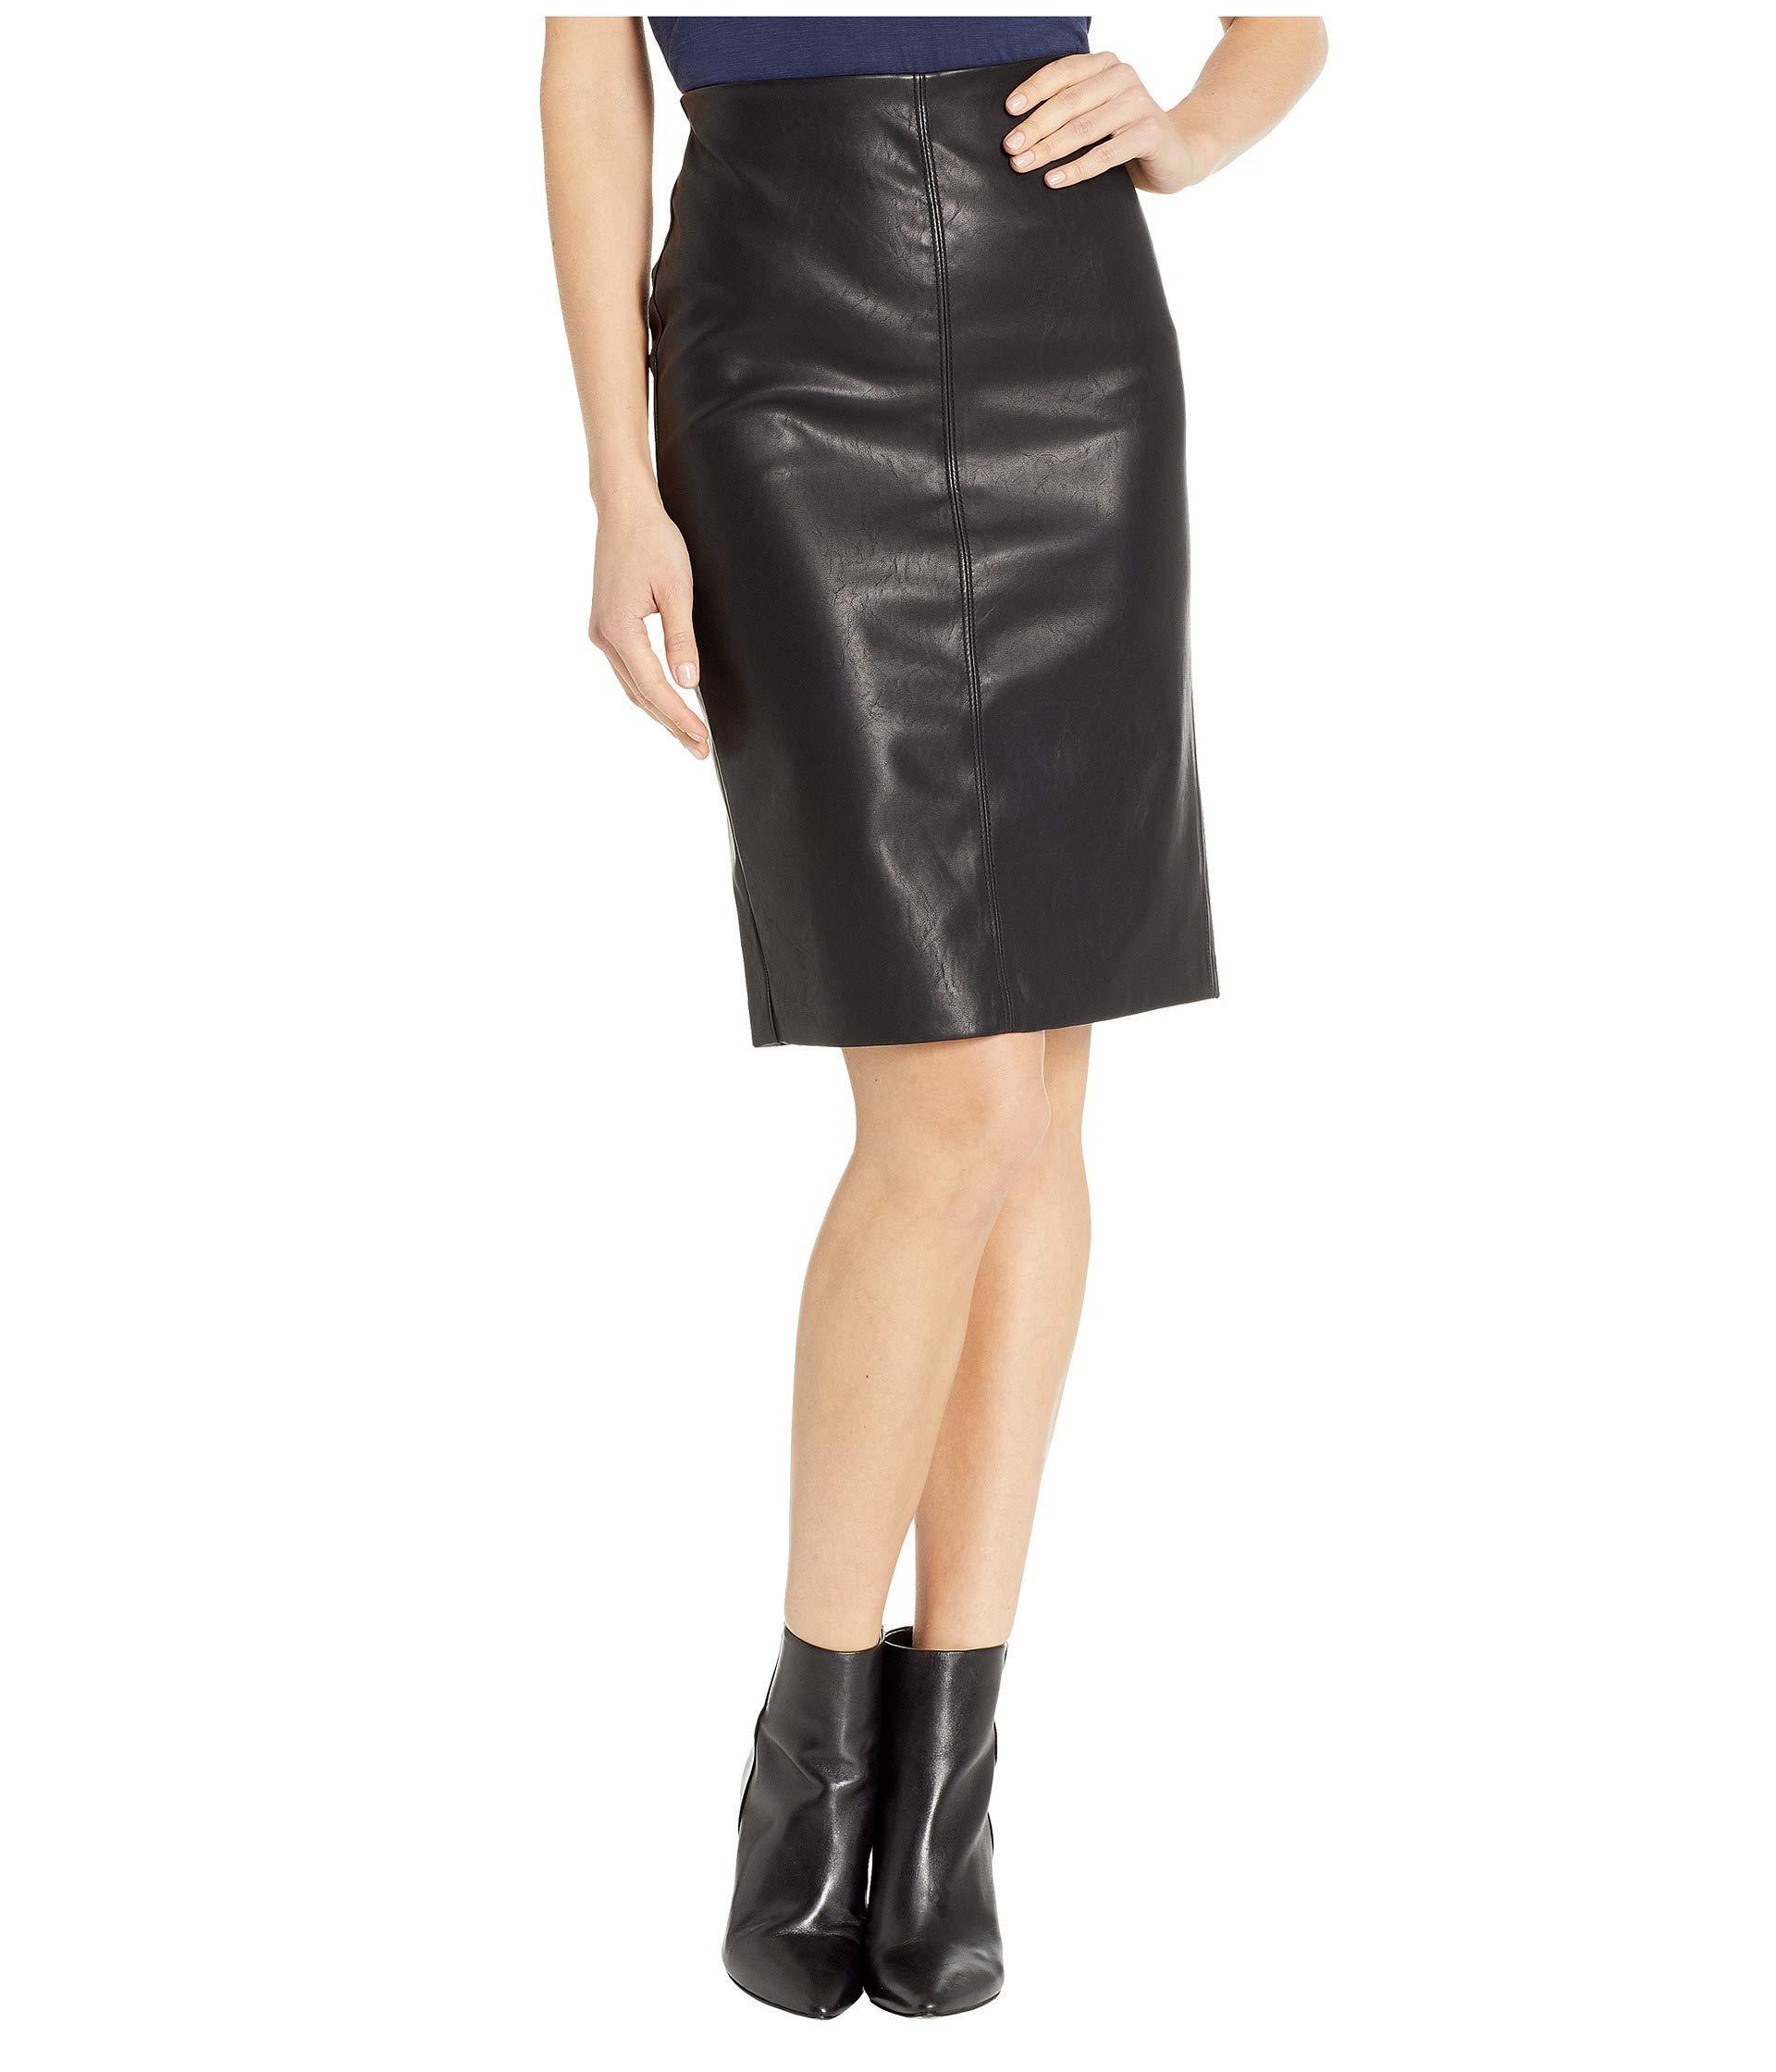 8e1578f8aeb598 Blank NYC - Vegan Leather Pull-on Pencil Skirt In Schooled-black - Lyst.  View fullscreen